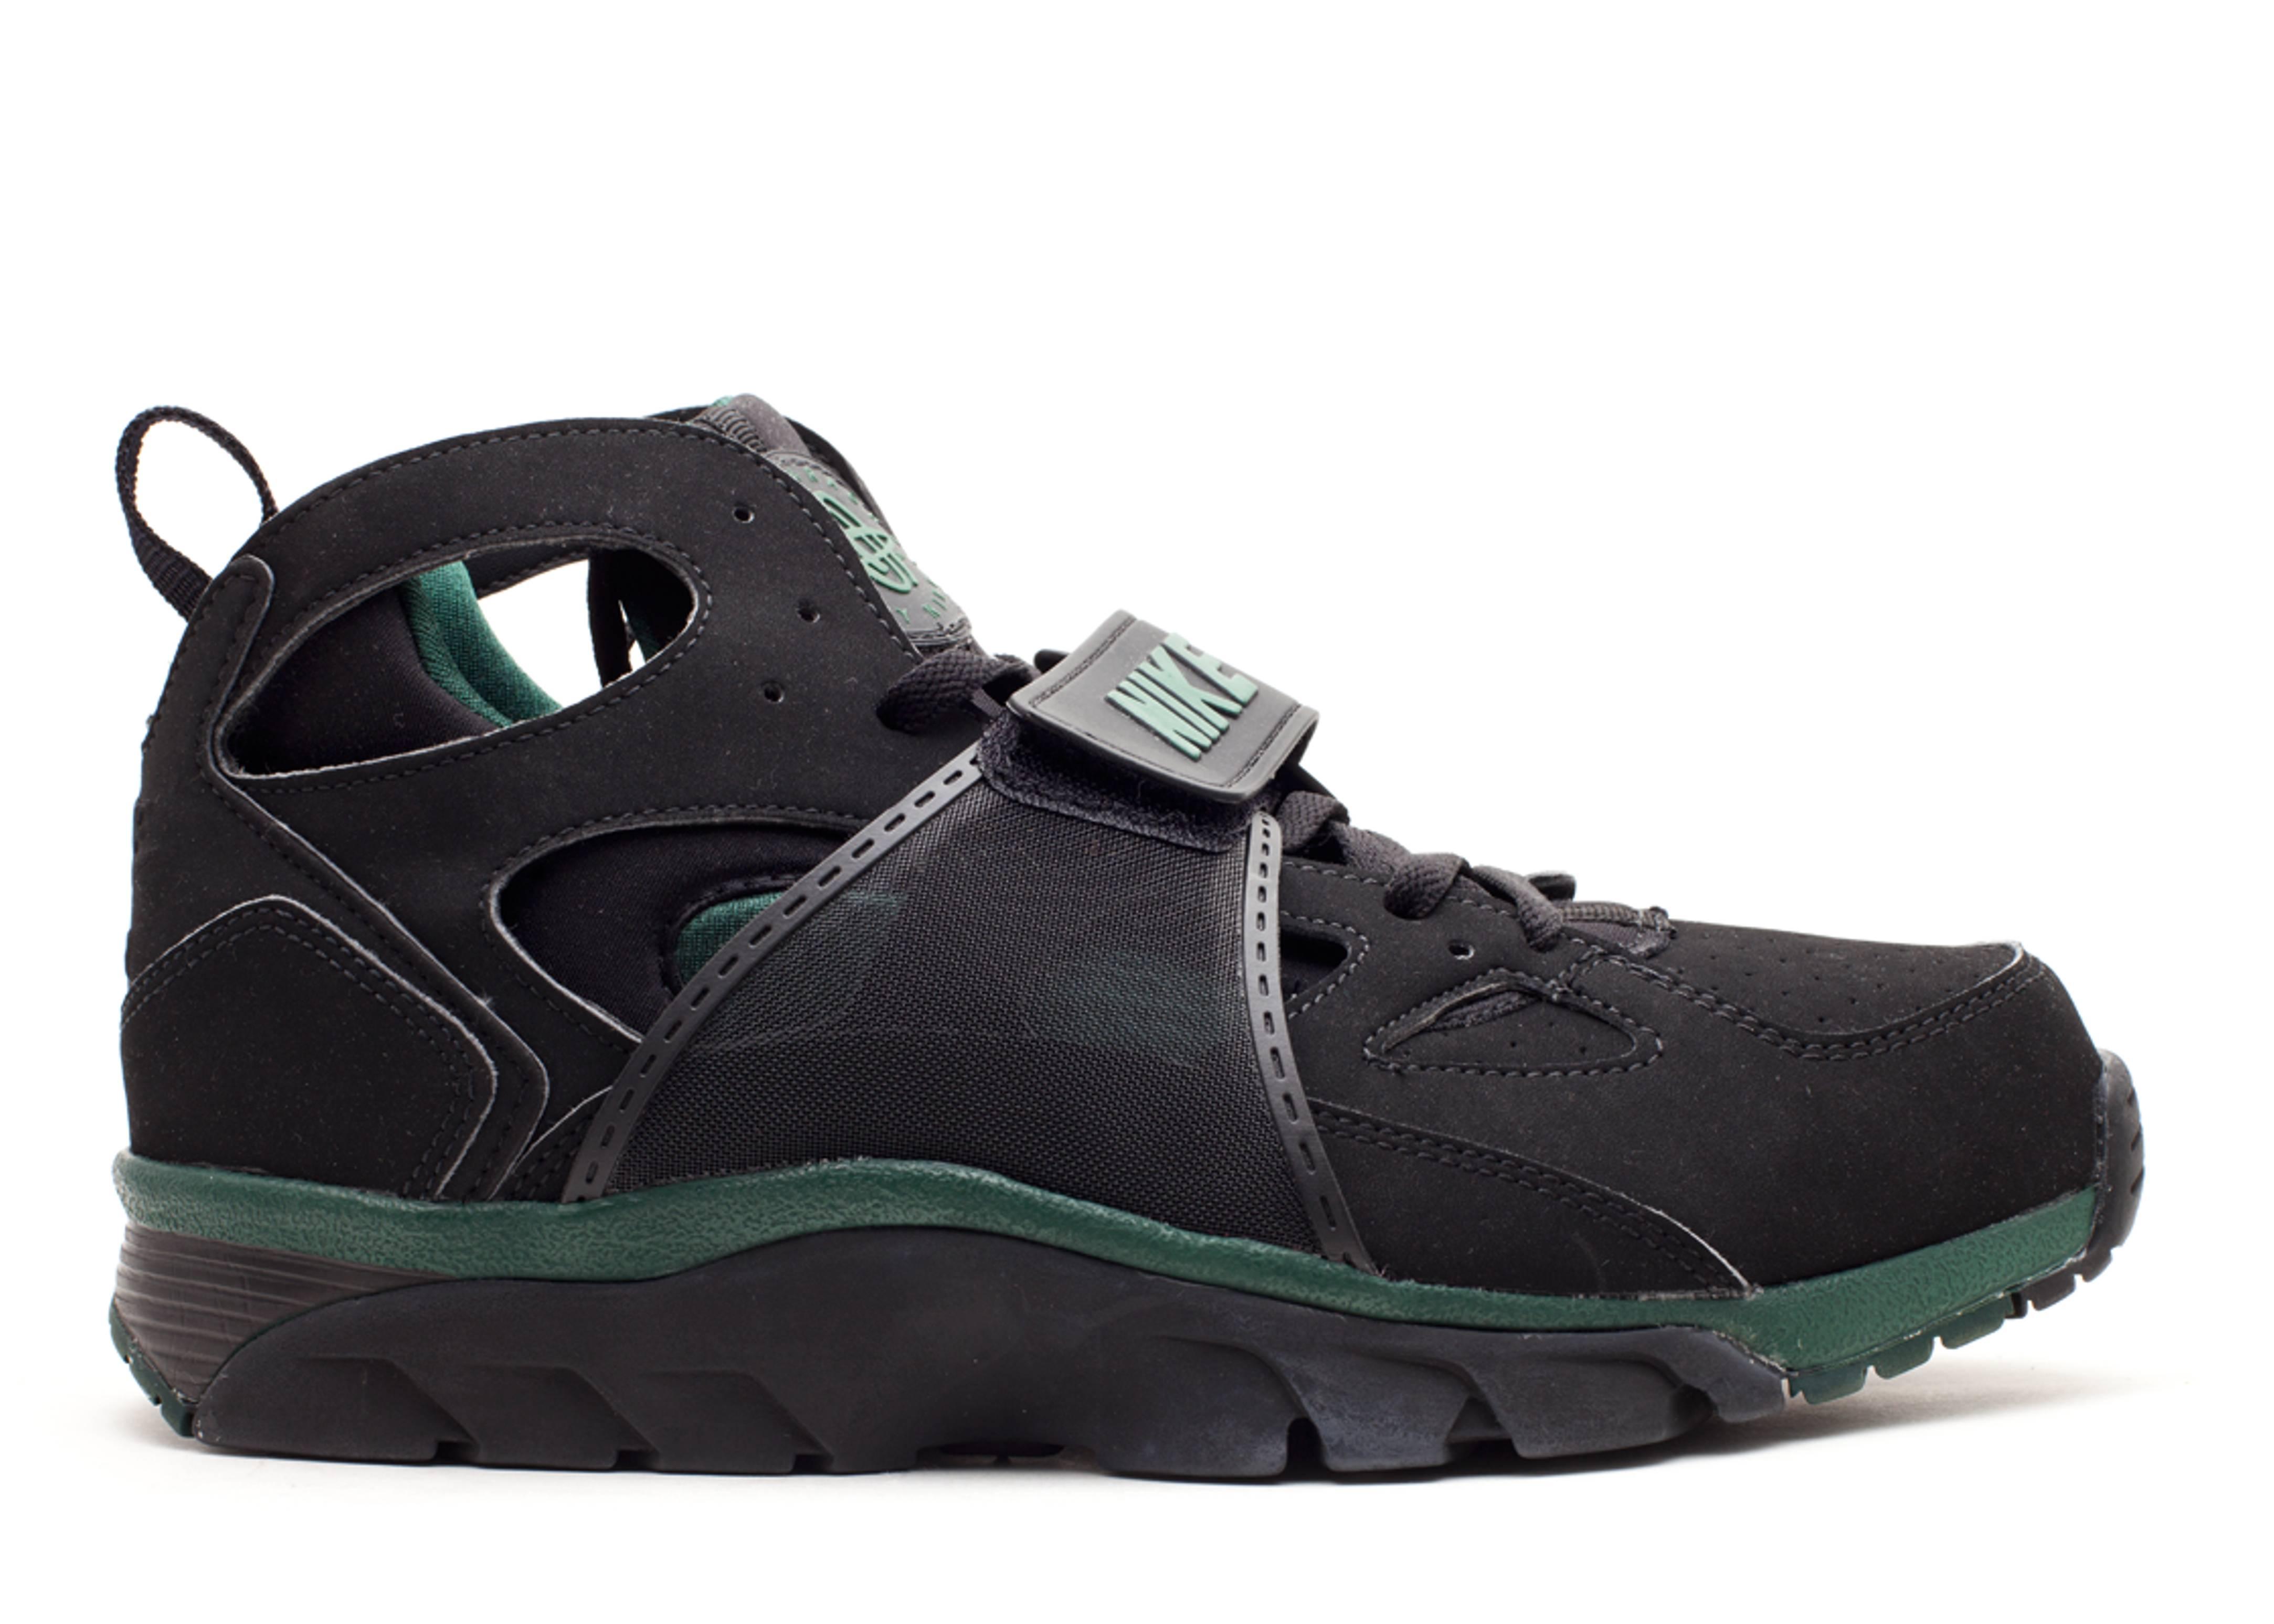 best service 213b4 21133 Air Trainer Huarache - Nike - 679083 031 - black/black ...